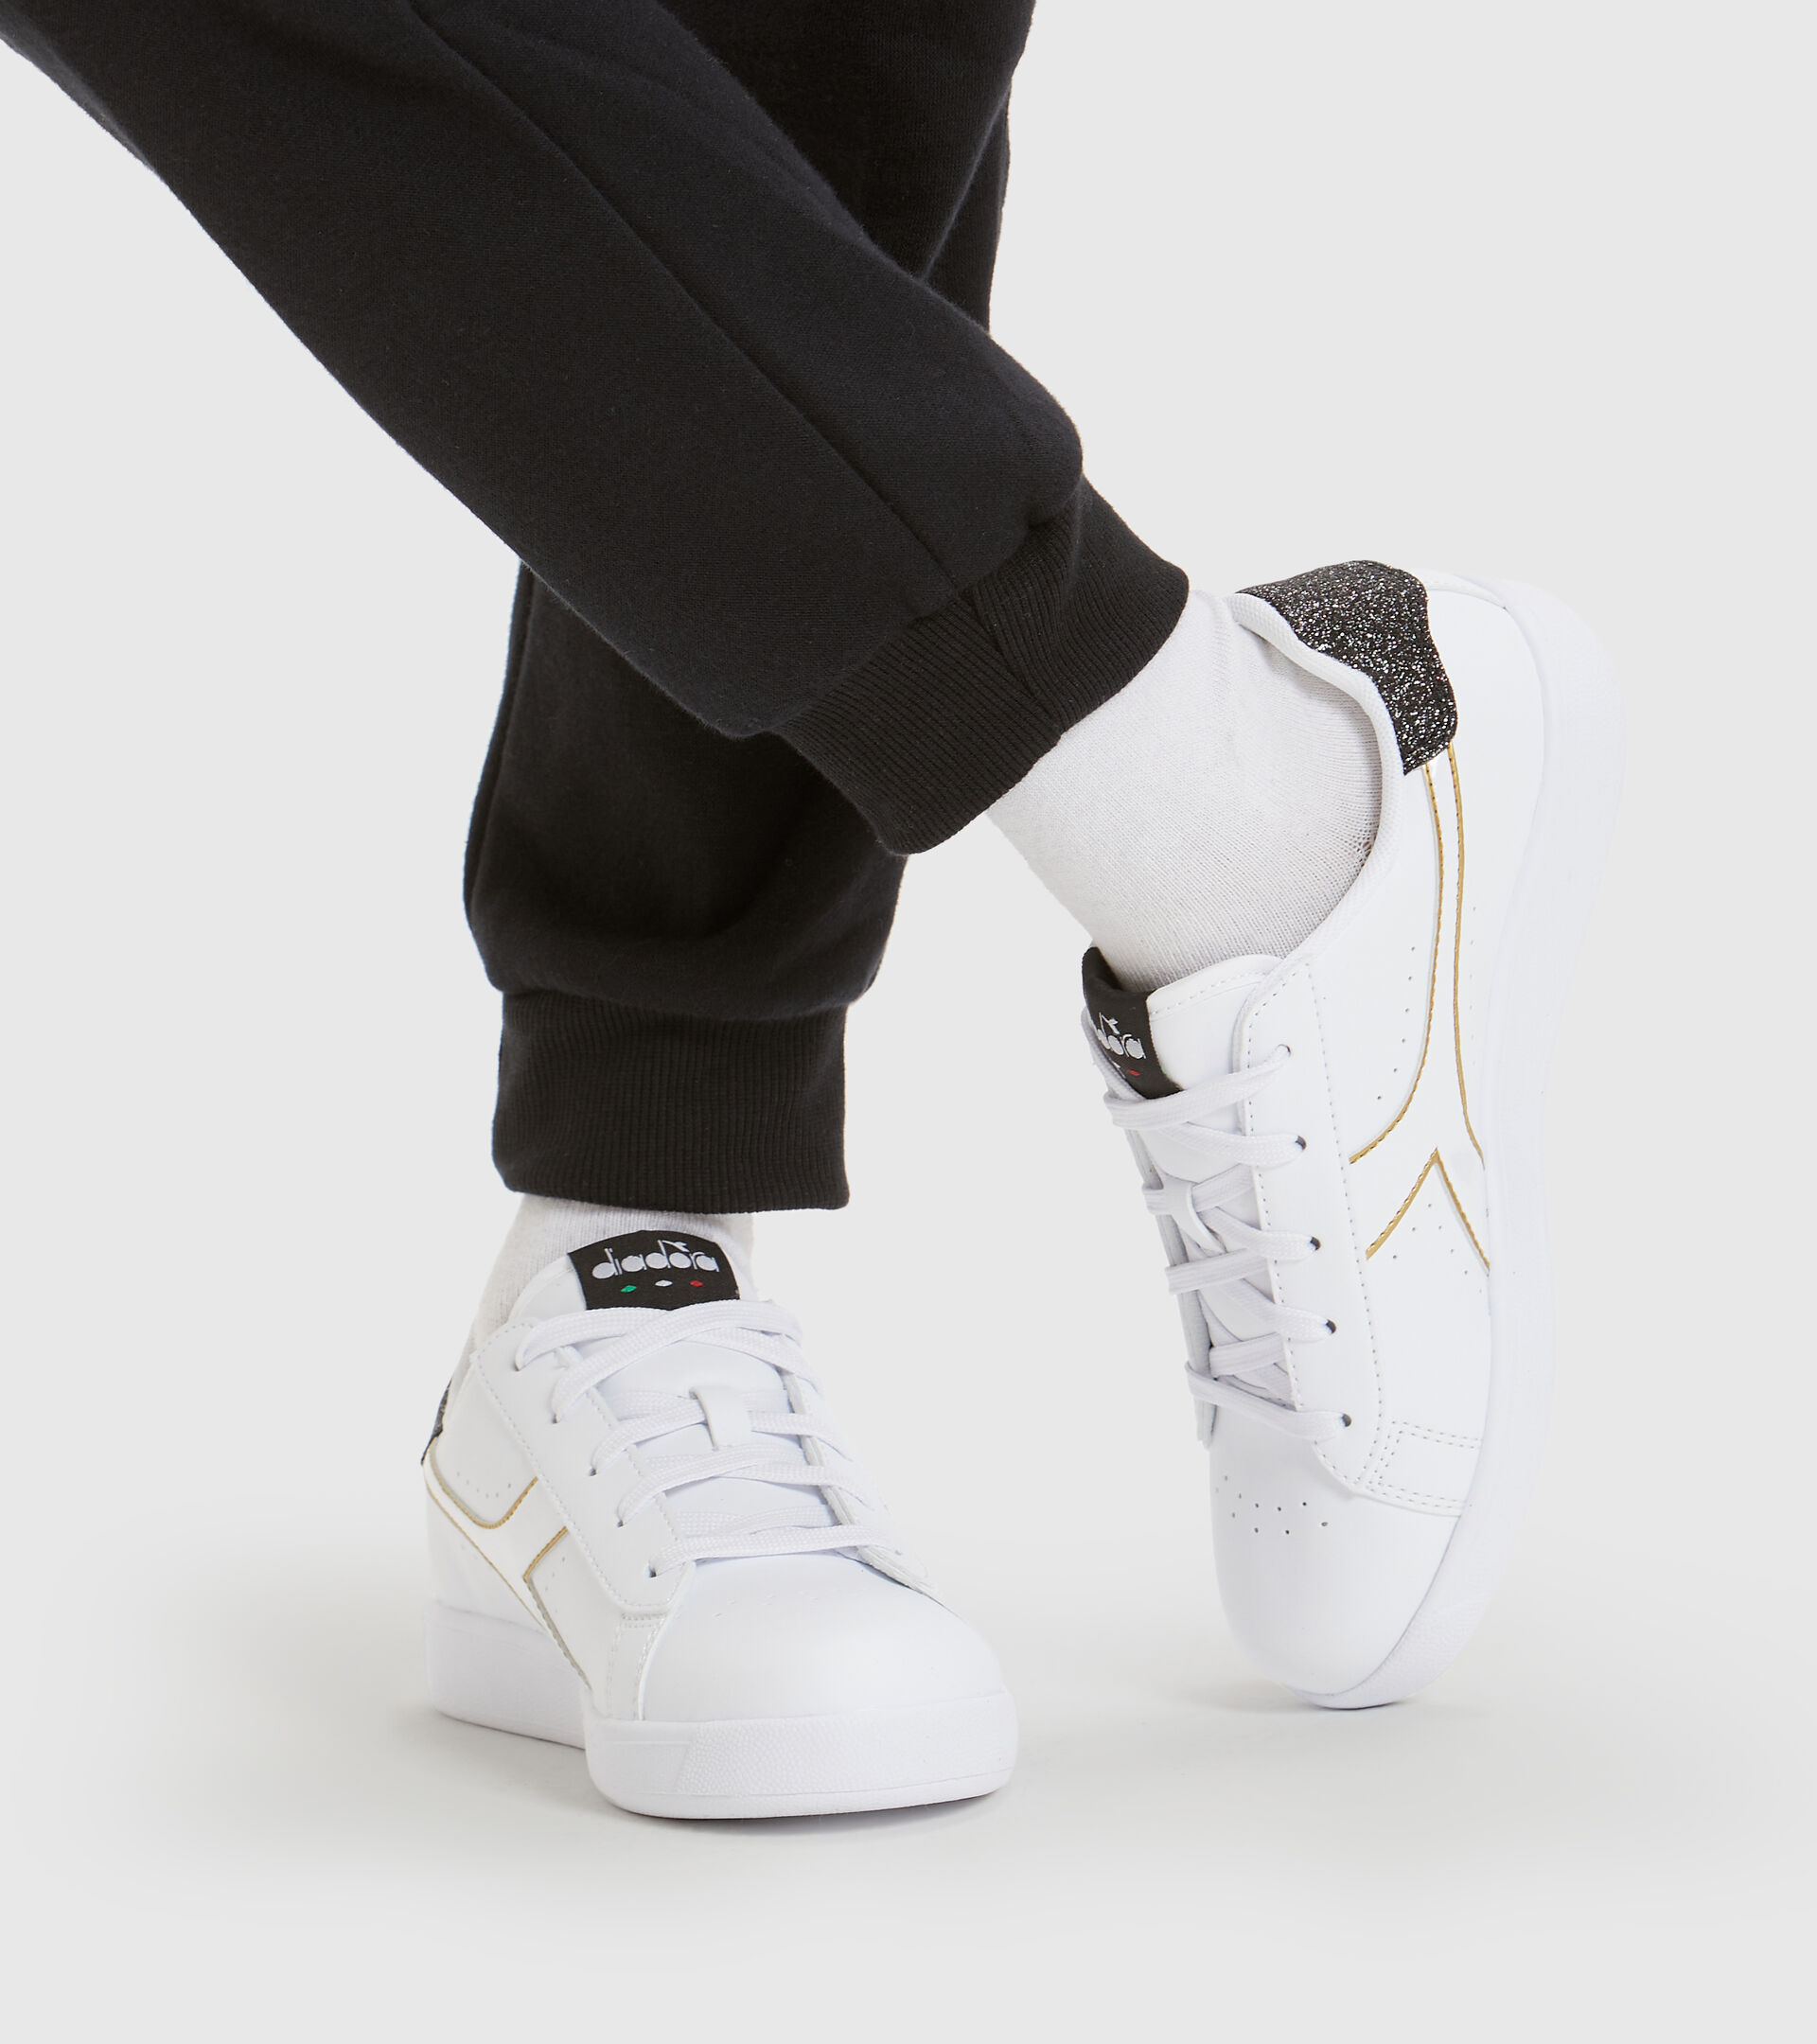 Footwear Sport BAMBINO GAME P GS GIRL BIANCO/NERO/ORO Diadora